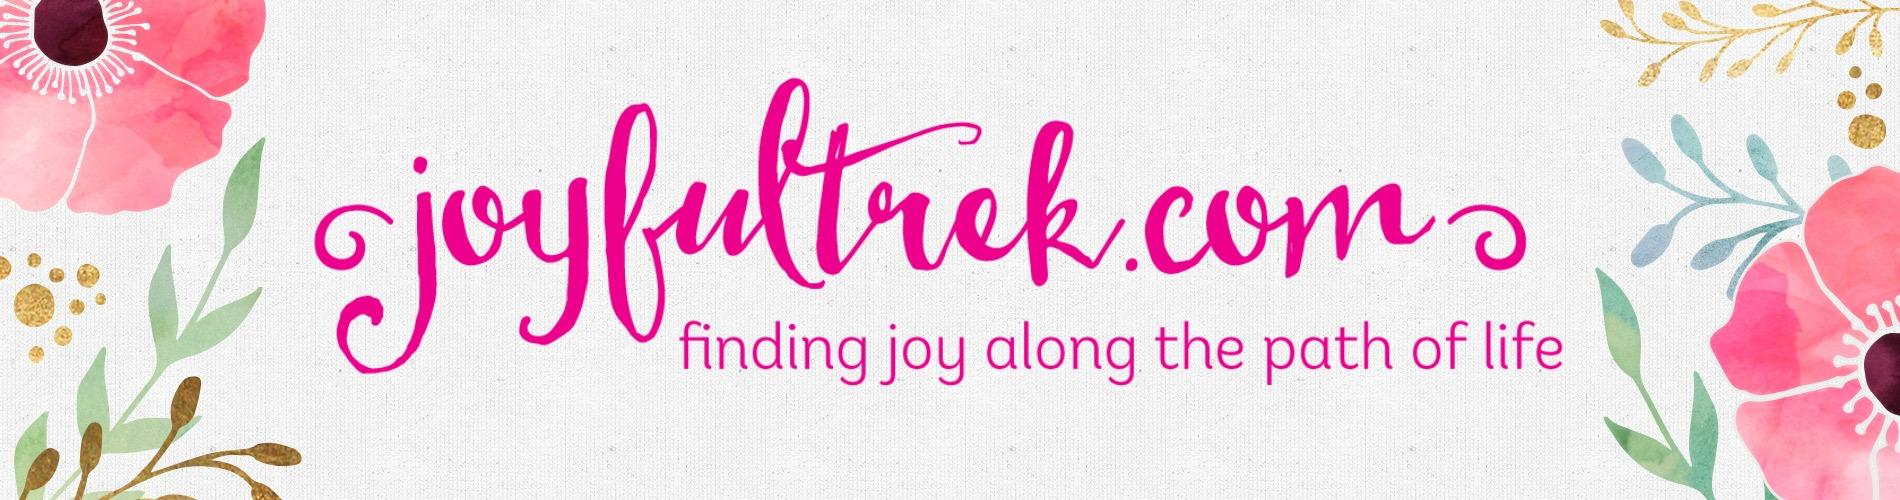 Joyfultrek.com